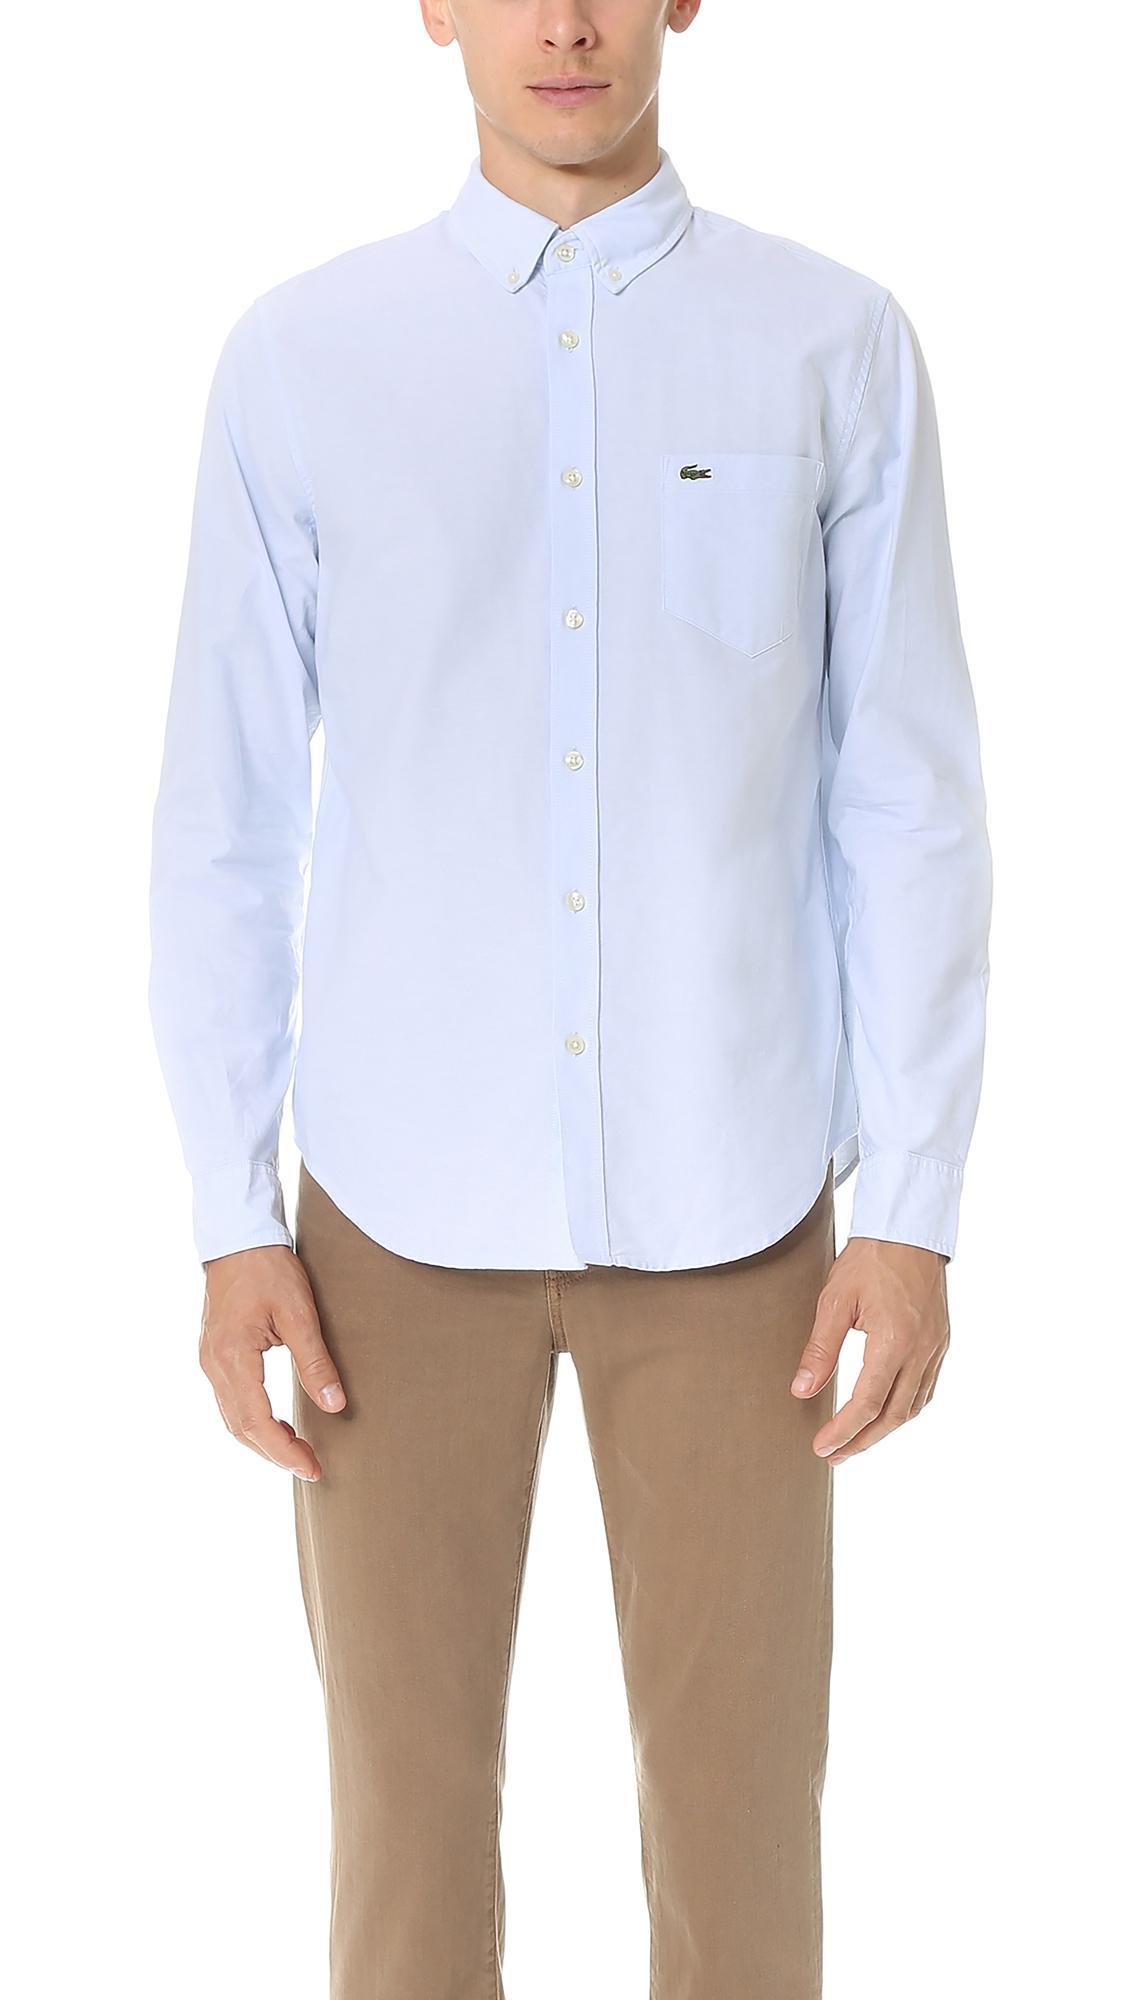 b9cf118e Button Down Oxford Shirt in Hemisphere